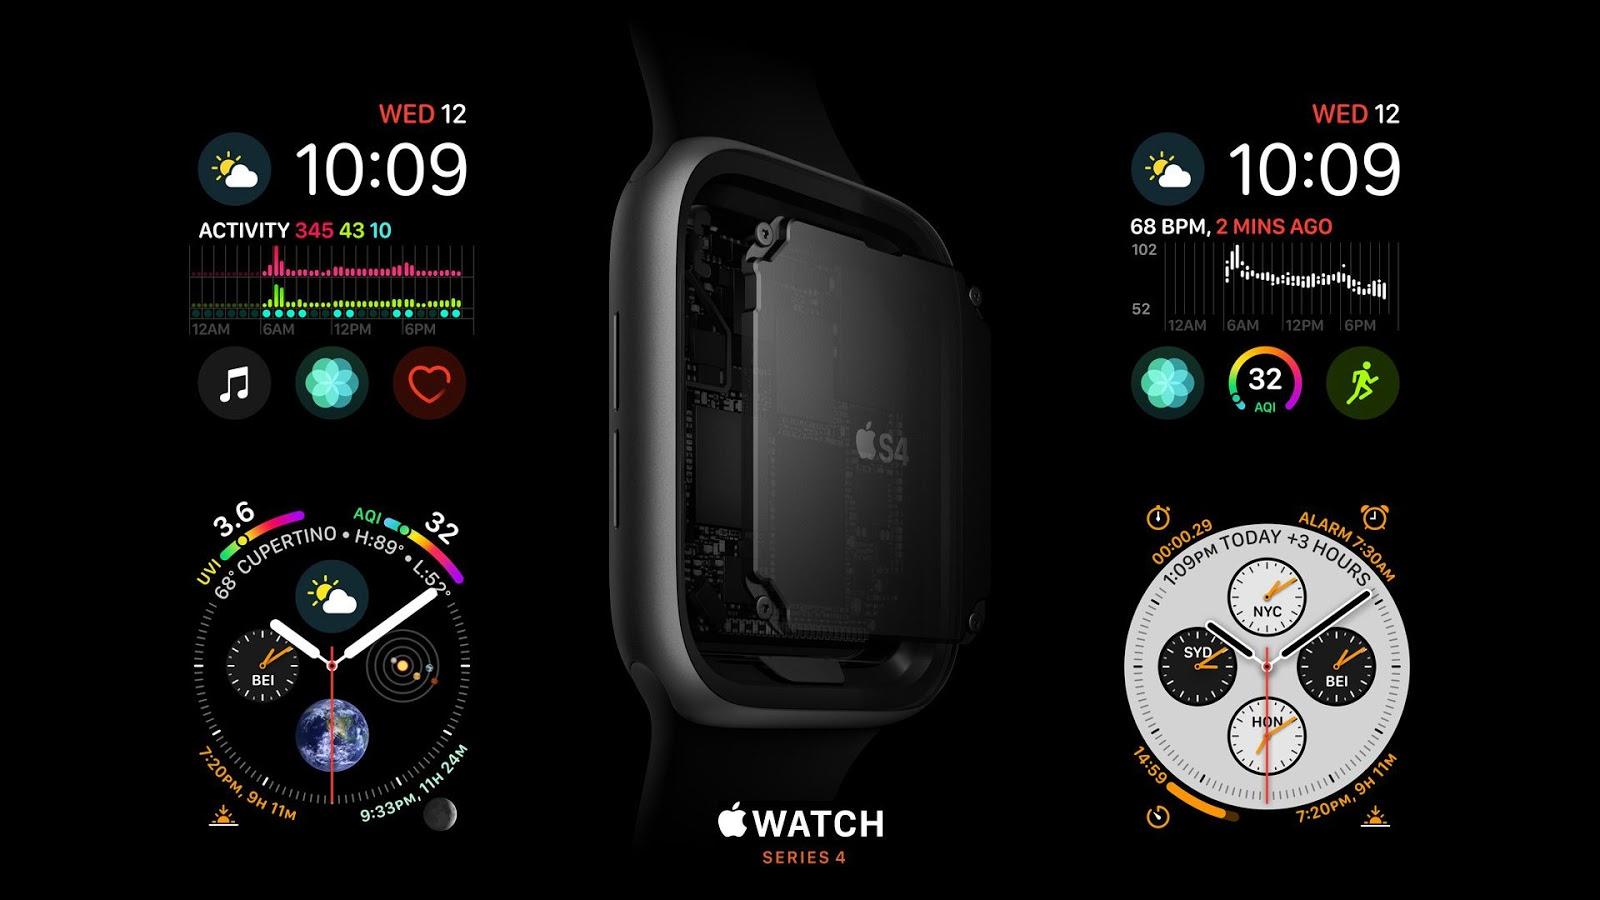 Wallpapers Apple Watch Series 4, S4, Apple image